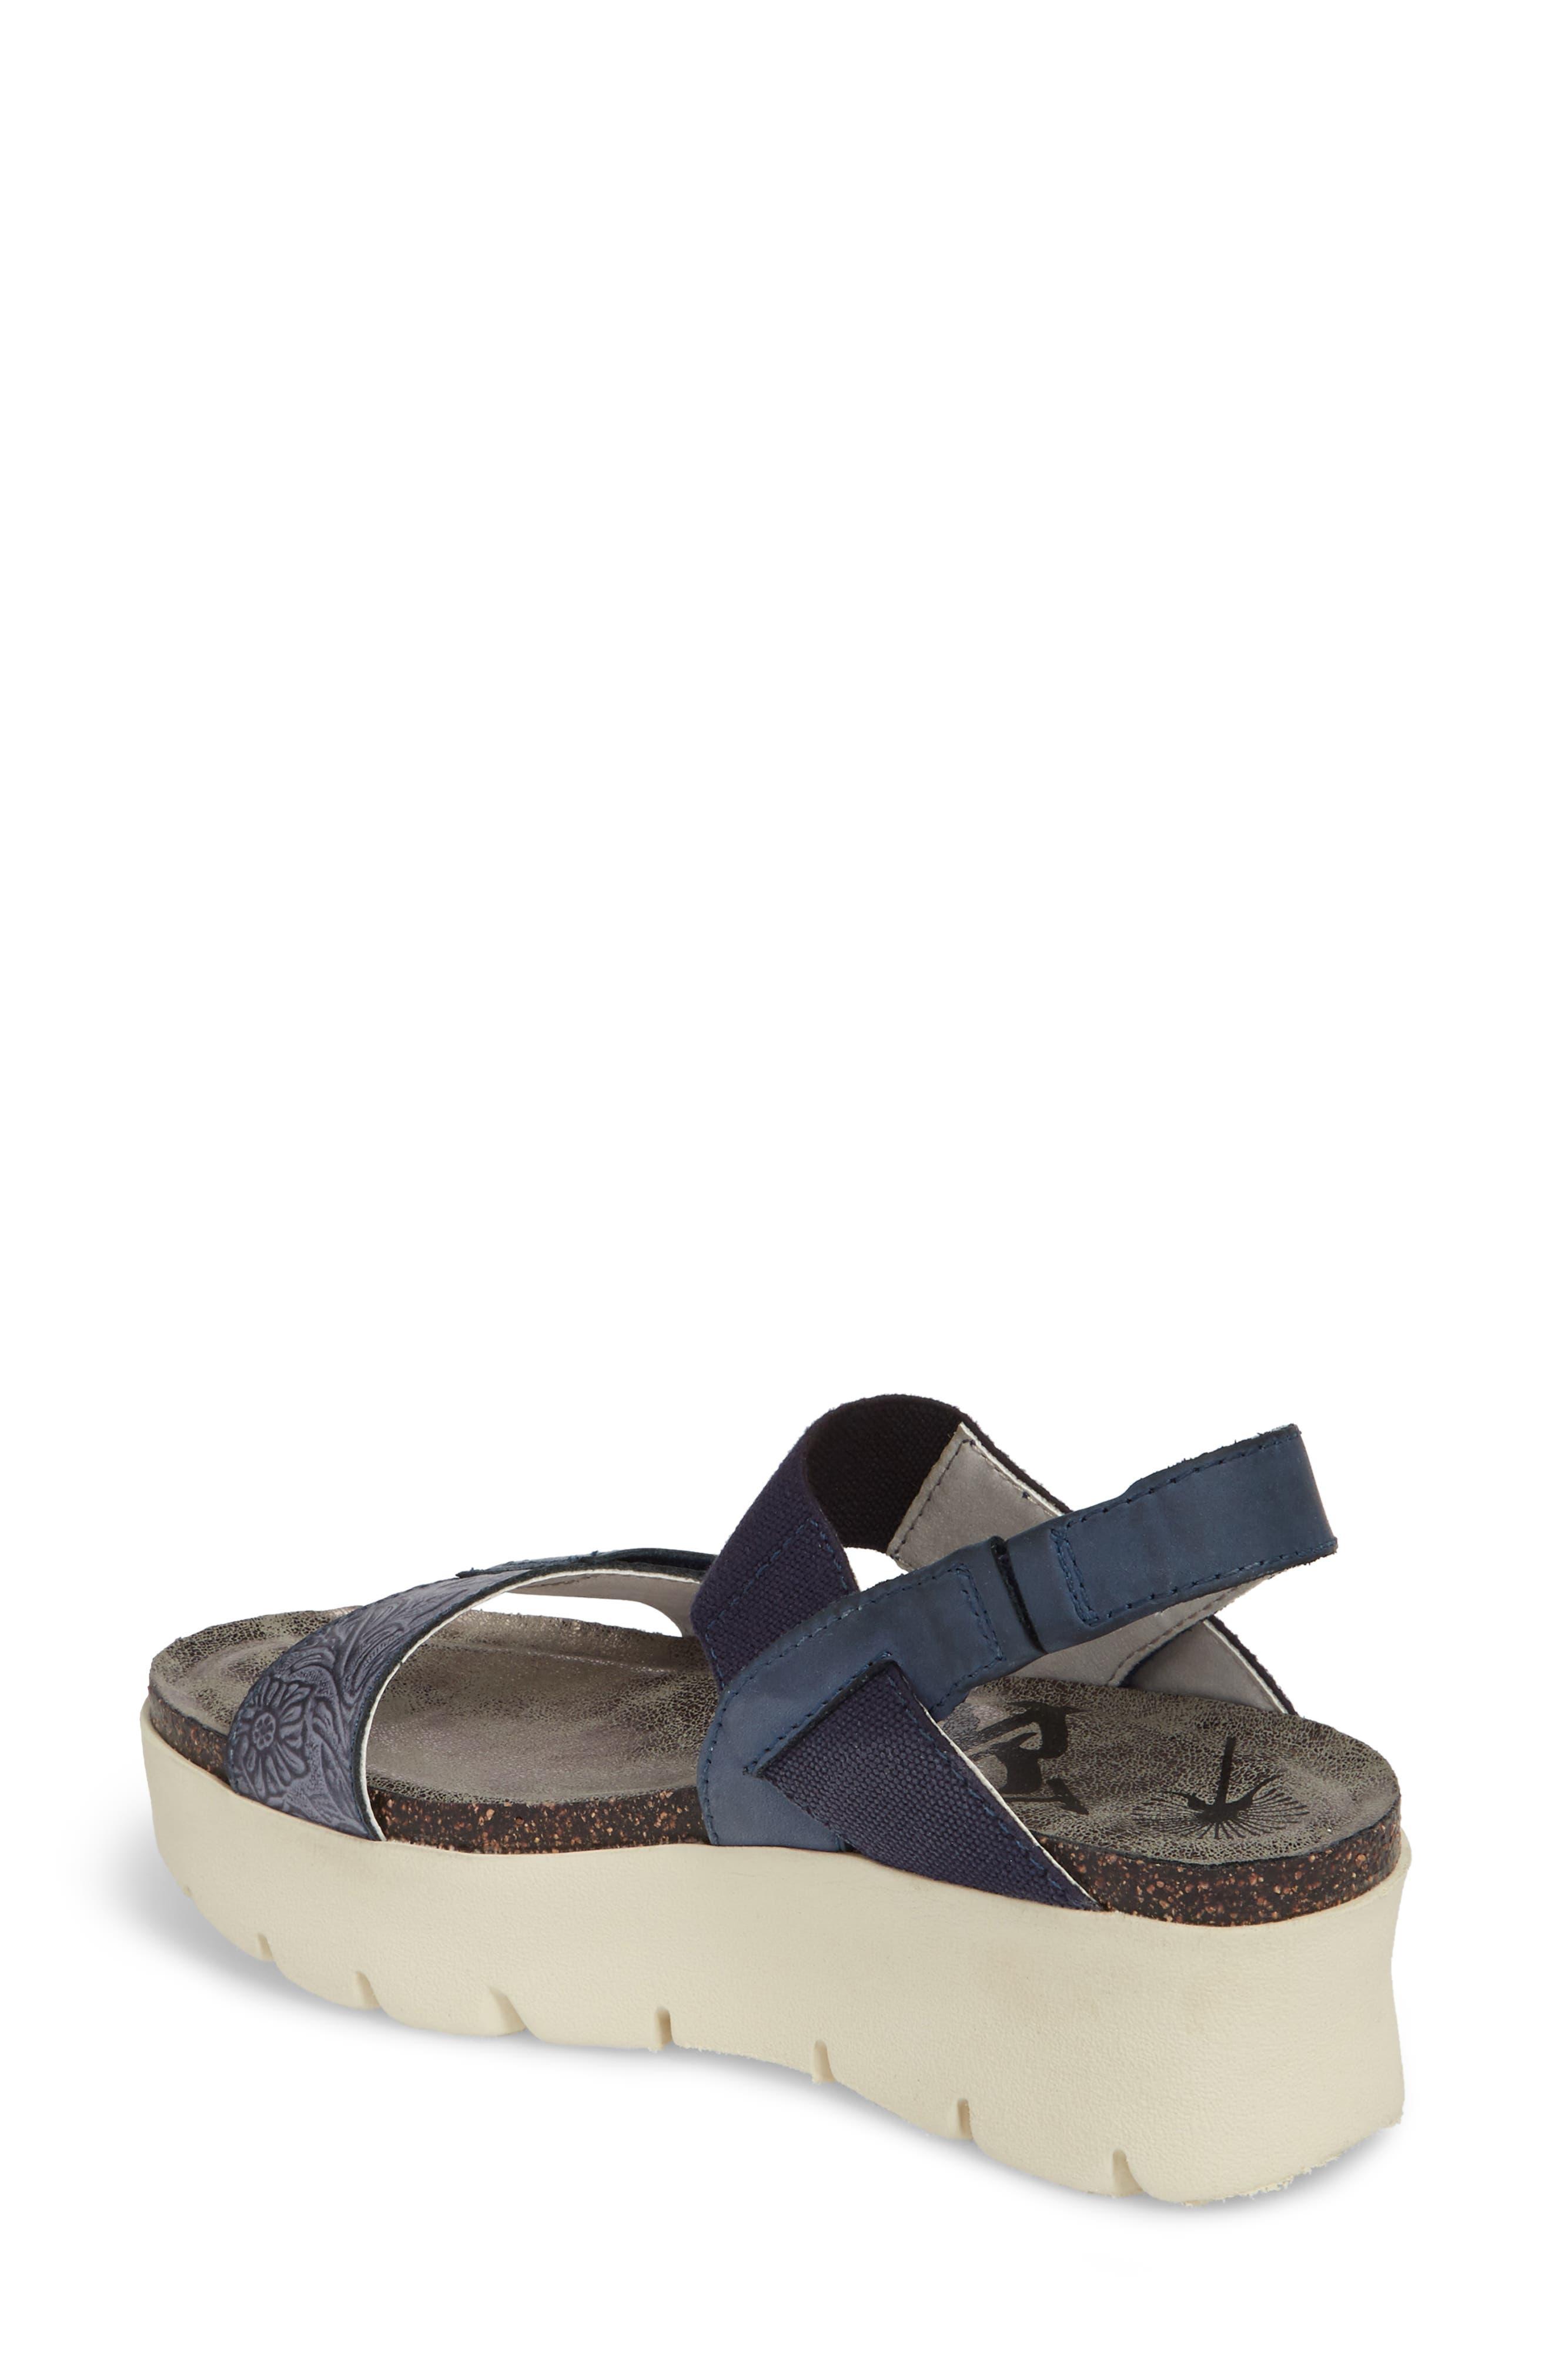 Nova Platform Sandal,                             Alternate thumbnail 2, color,                             Navy Leather